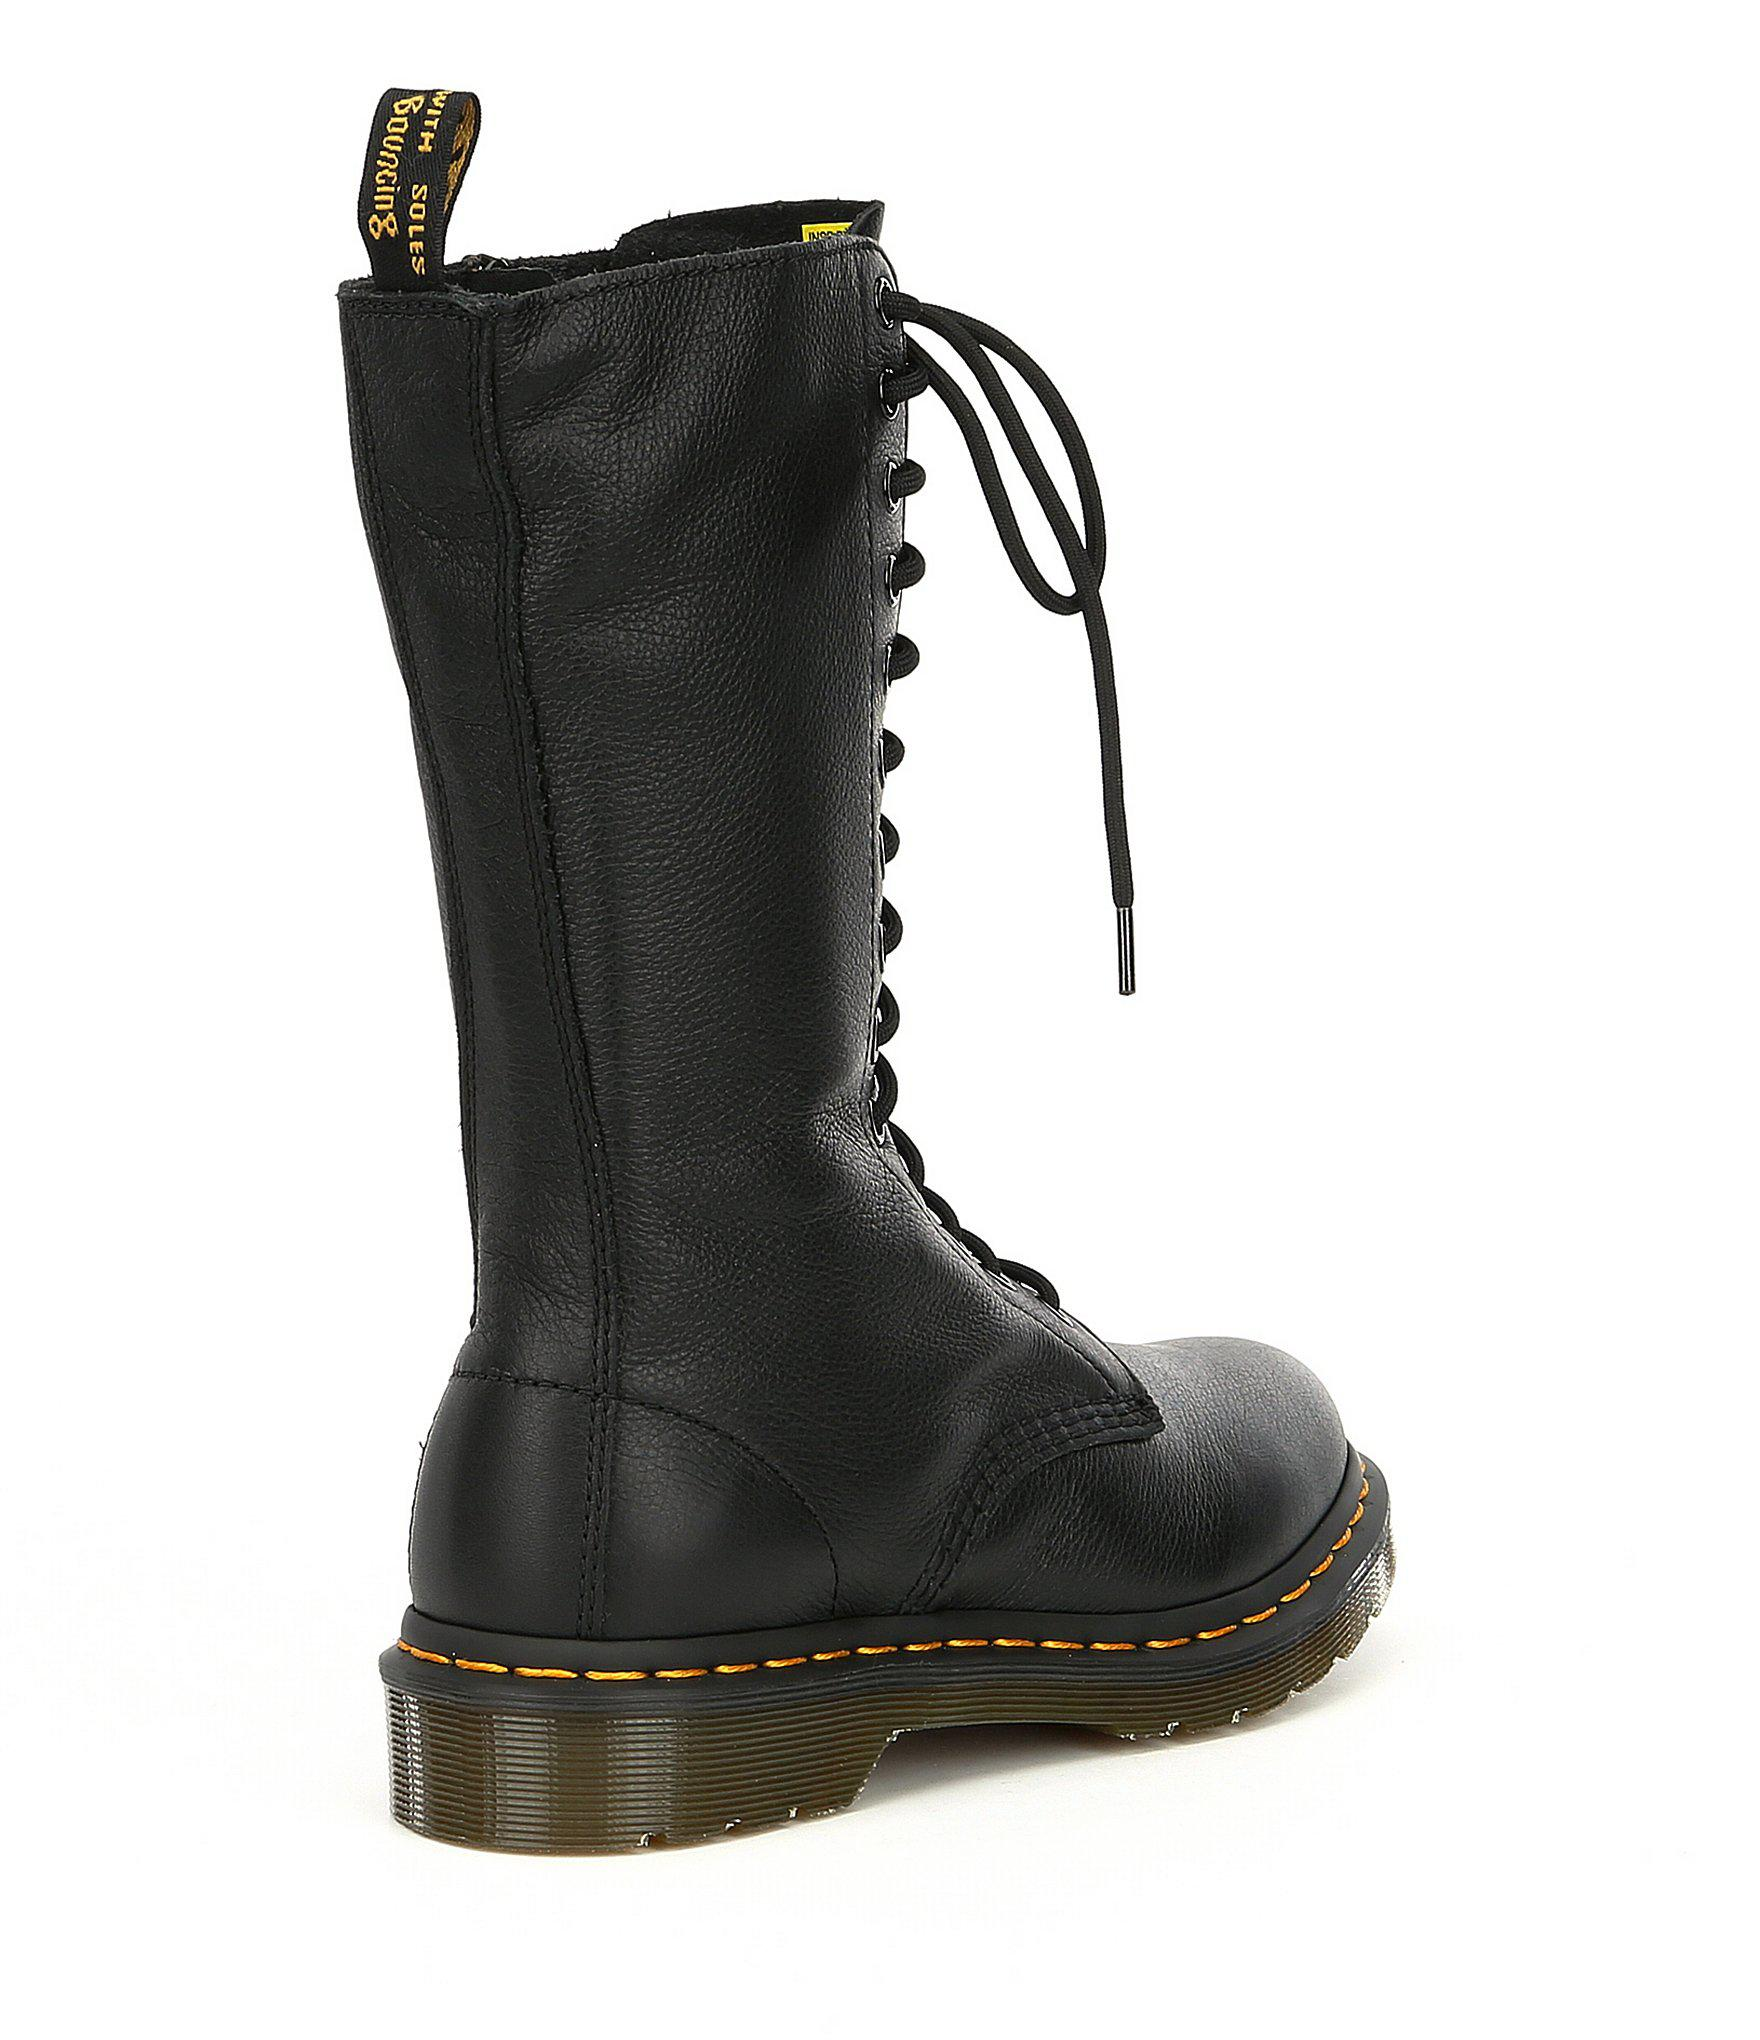 15aa4b6a9112 Dr. Martens - 1b99 Black Virginia 14-eye Boots - Lyst. View fullscreen